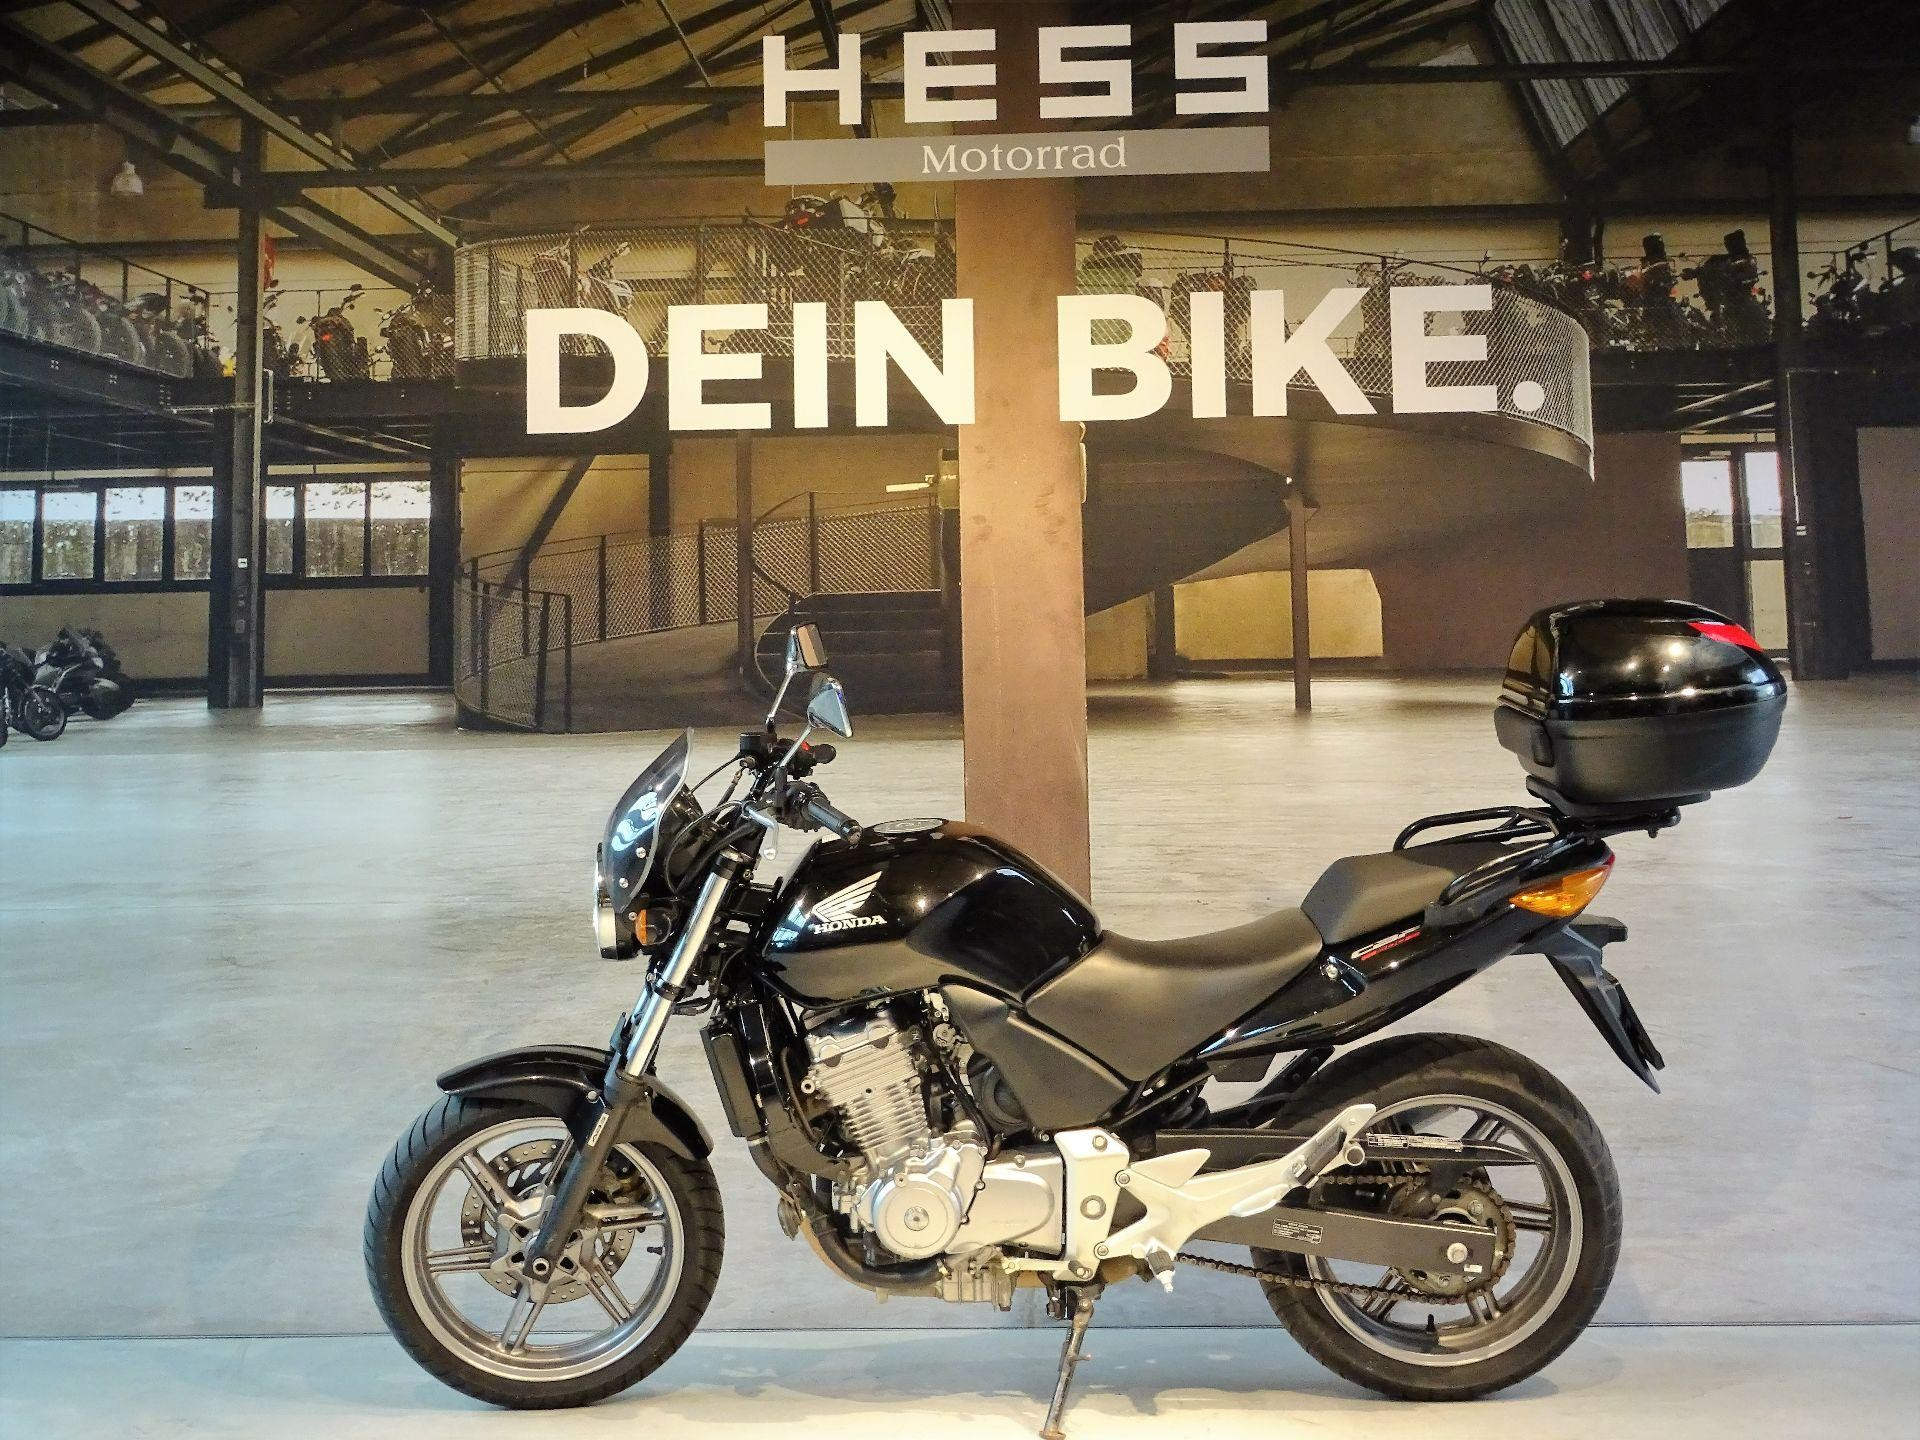 moto occasions acheter honda cbf 500 abs hess motorrad stettlen. Black Bedroom Furniture Sets. Home Design Ideas